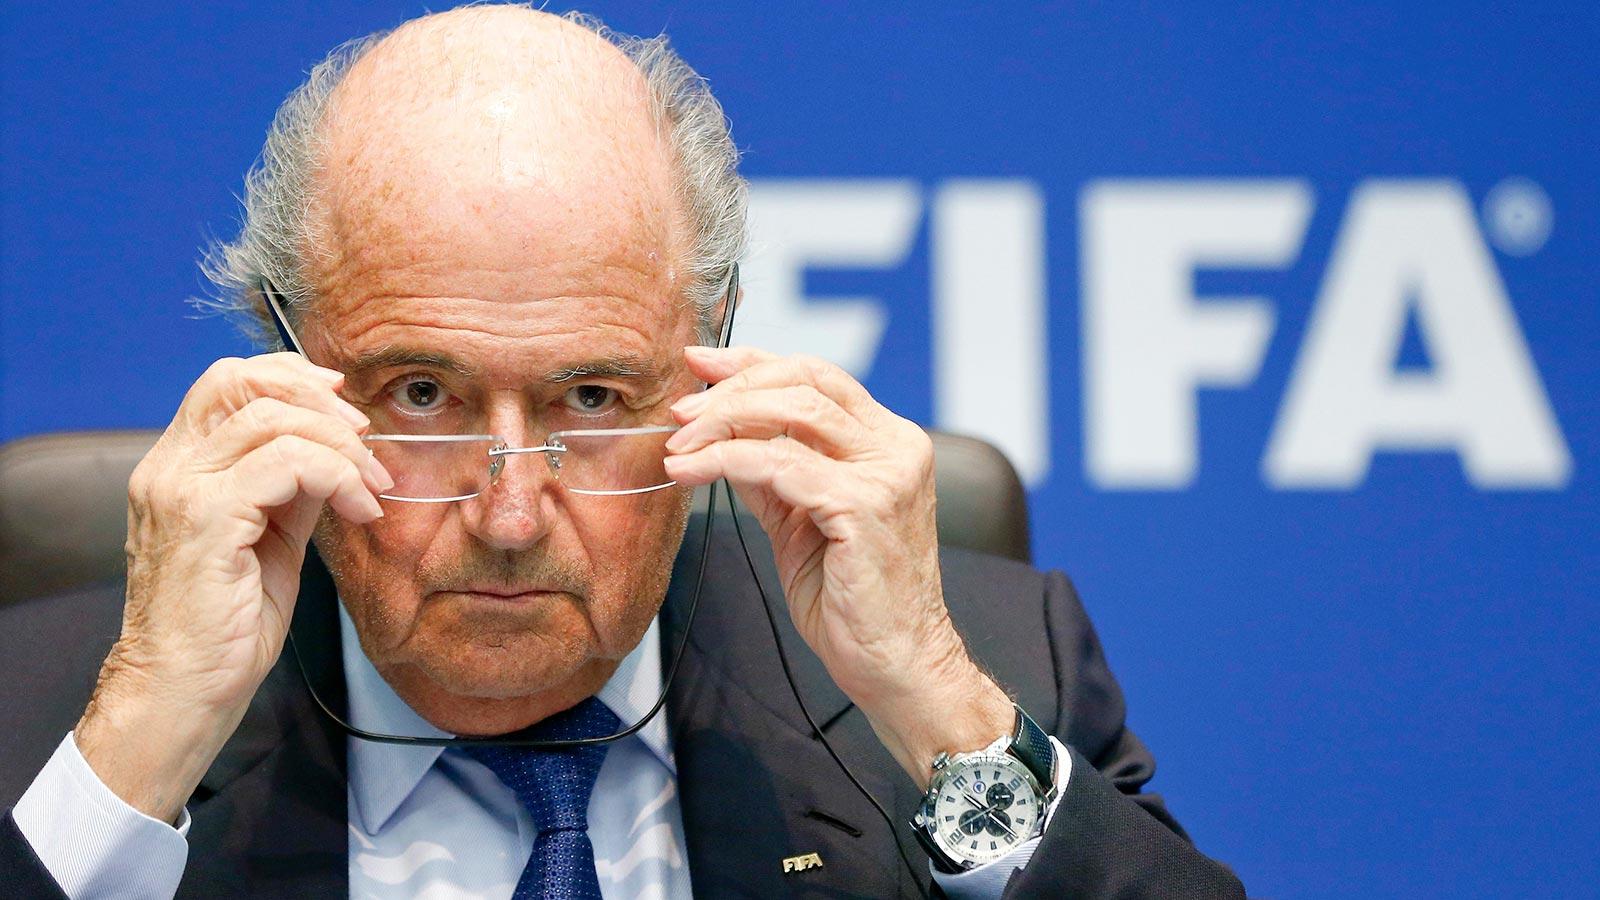 ФИФА грозит России санкциями из-за расизма